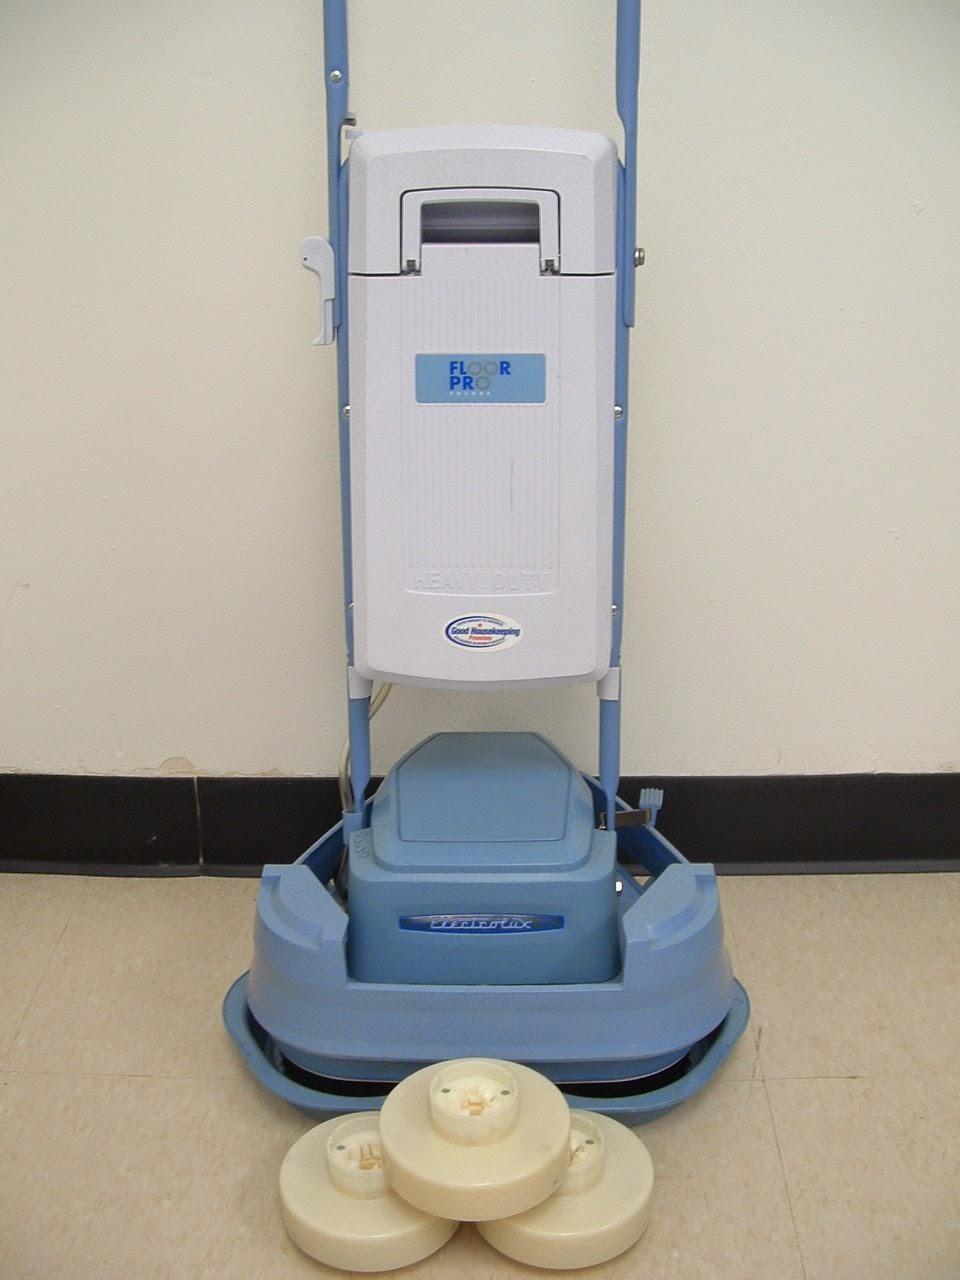 carpet shampooer: electrolux carpet shampooer